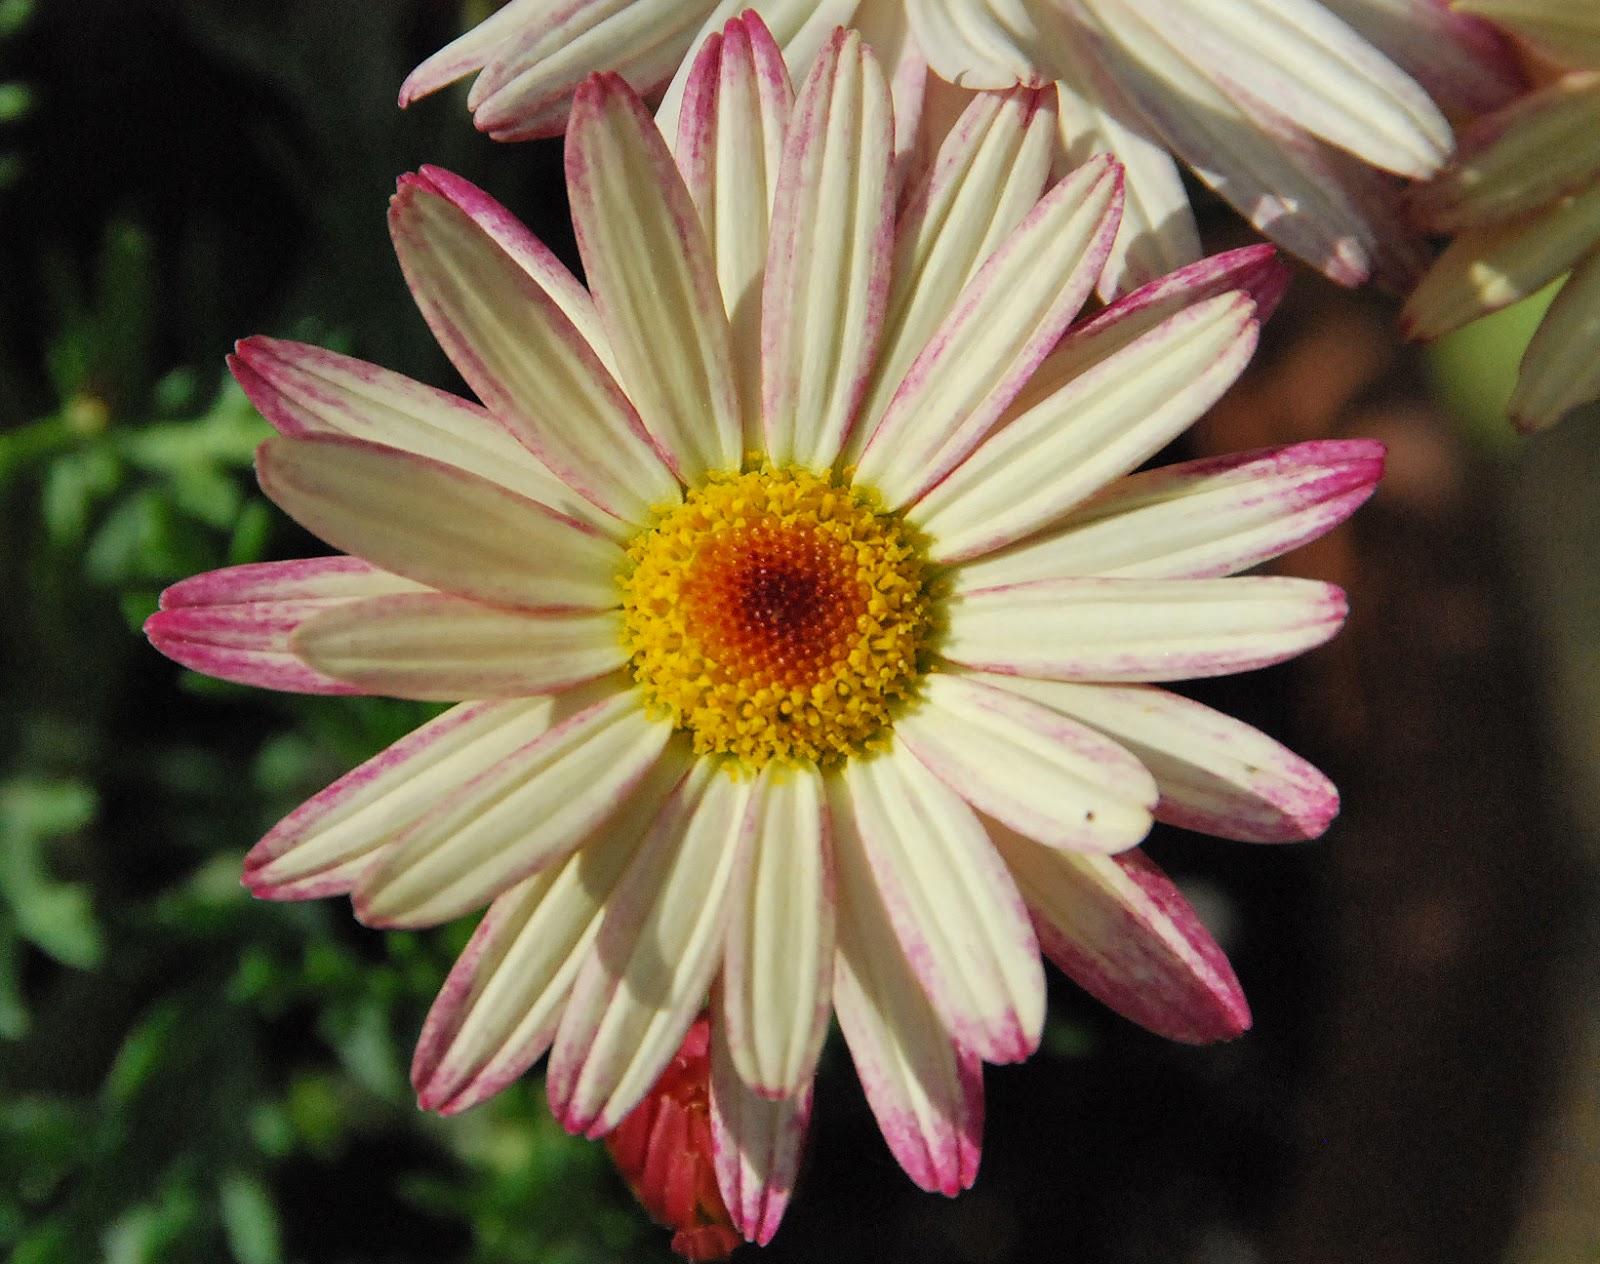 Diversos tipos de flores Floricultura Juliana Flor - Fotos De Diversos Tipos De Flores